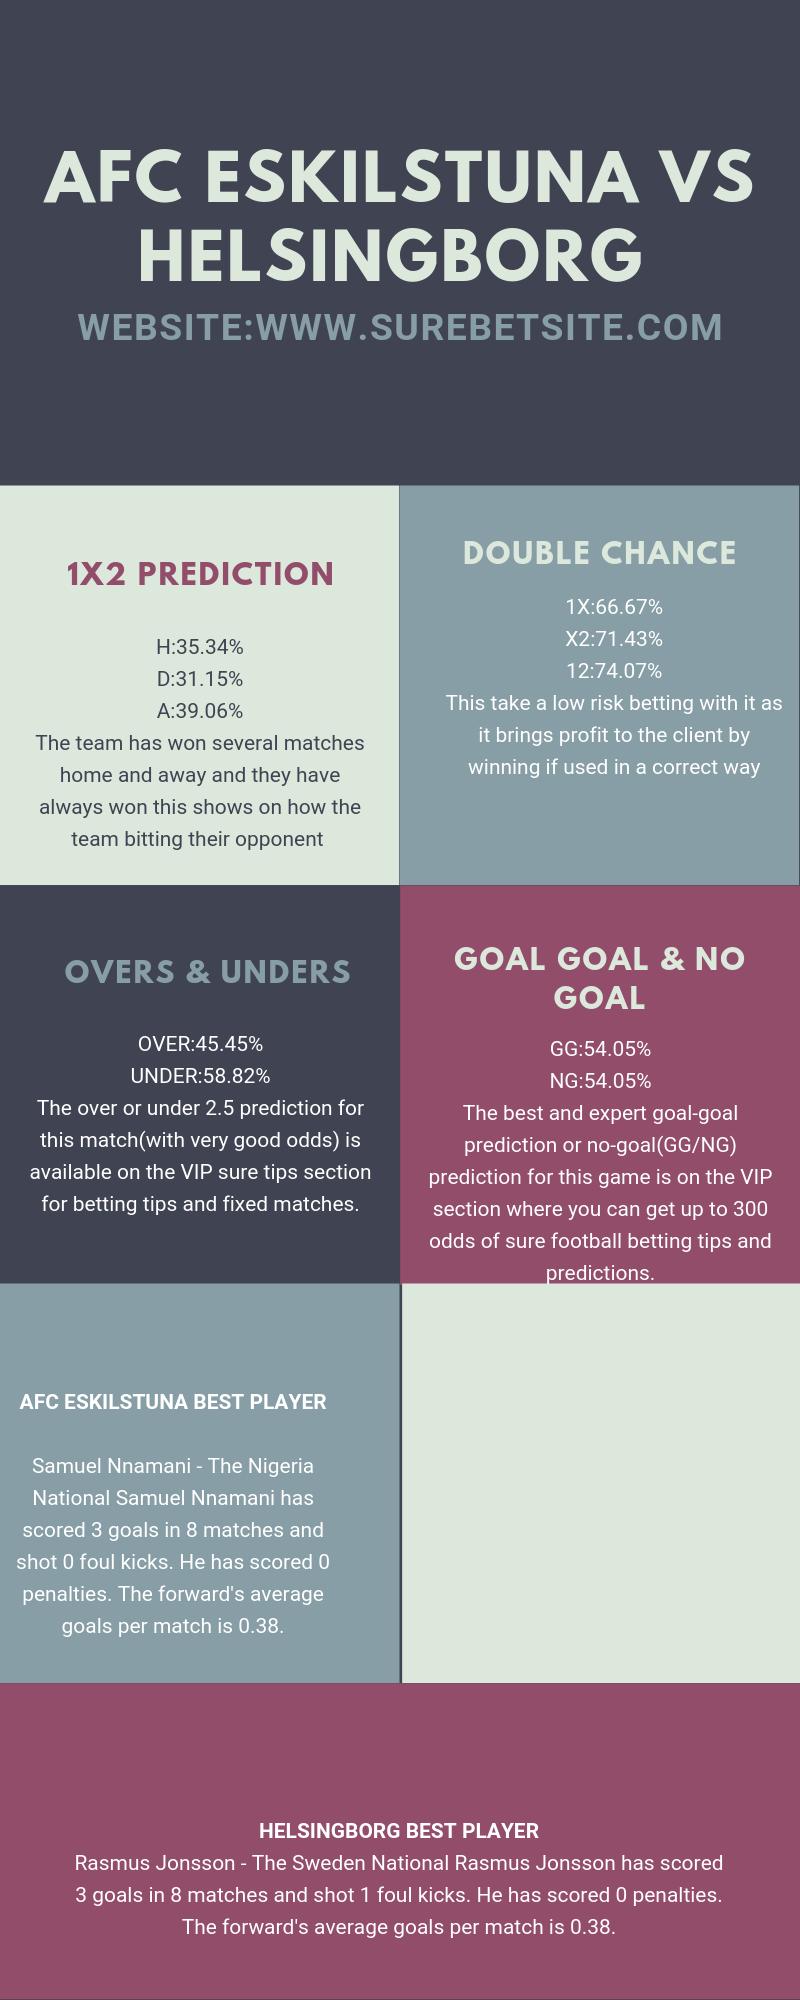 AFC ESKILSTUNA VS HELSINGBORG 1X2 PREDICTION Probability of winning